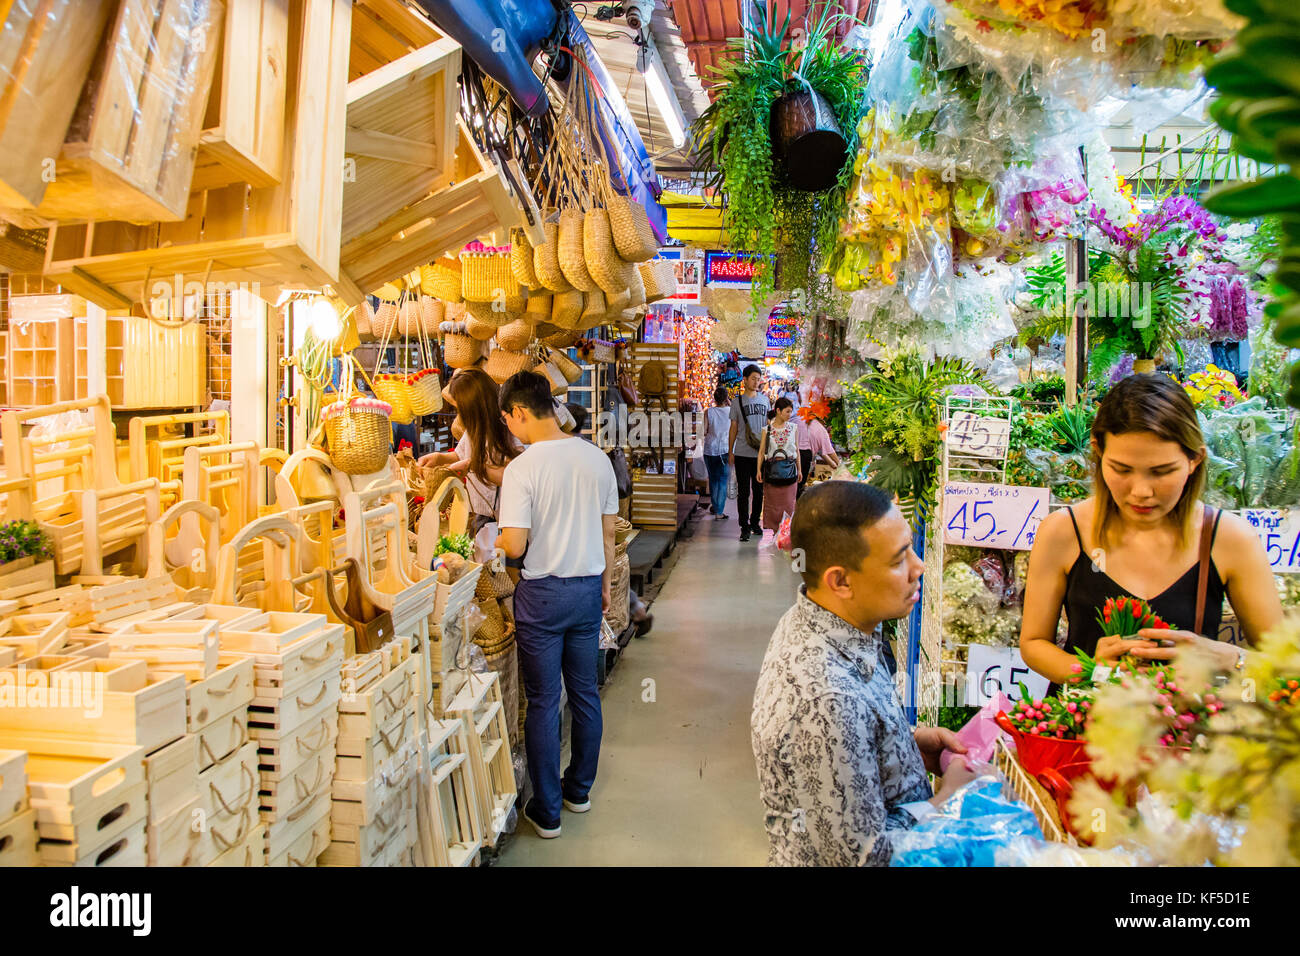 Chatuchak weekend market, Bangkok, Thailand - Stock Image